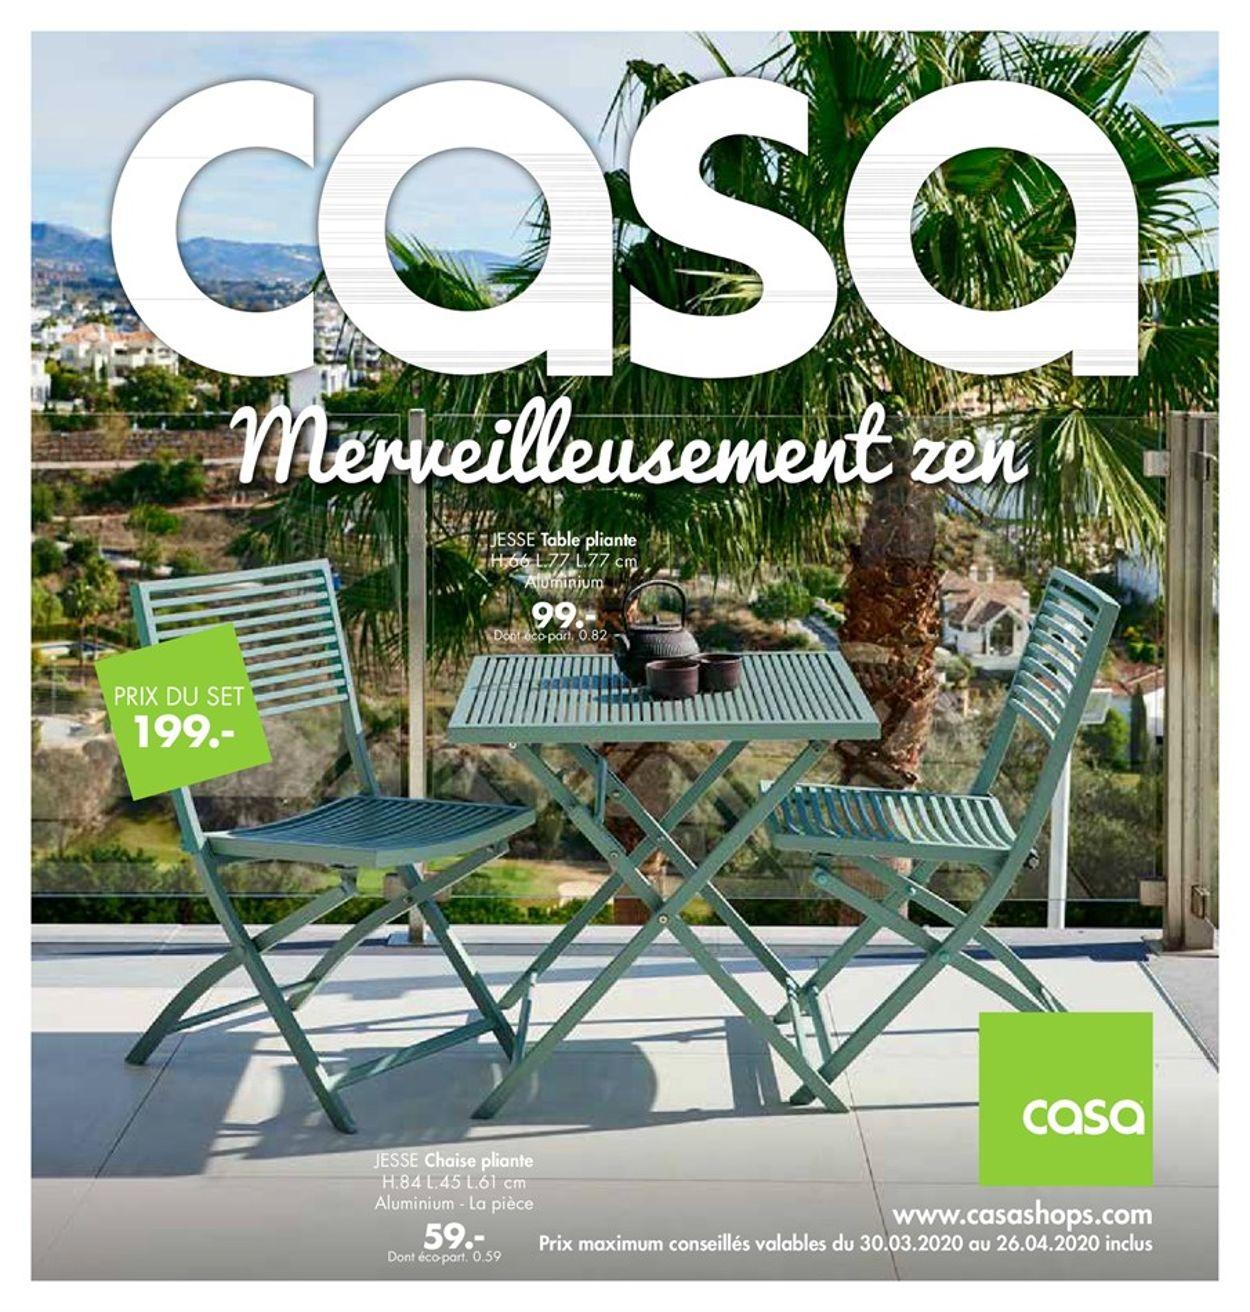 Casa Catalogue - 30.03-26.04.2020